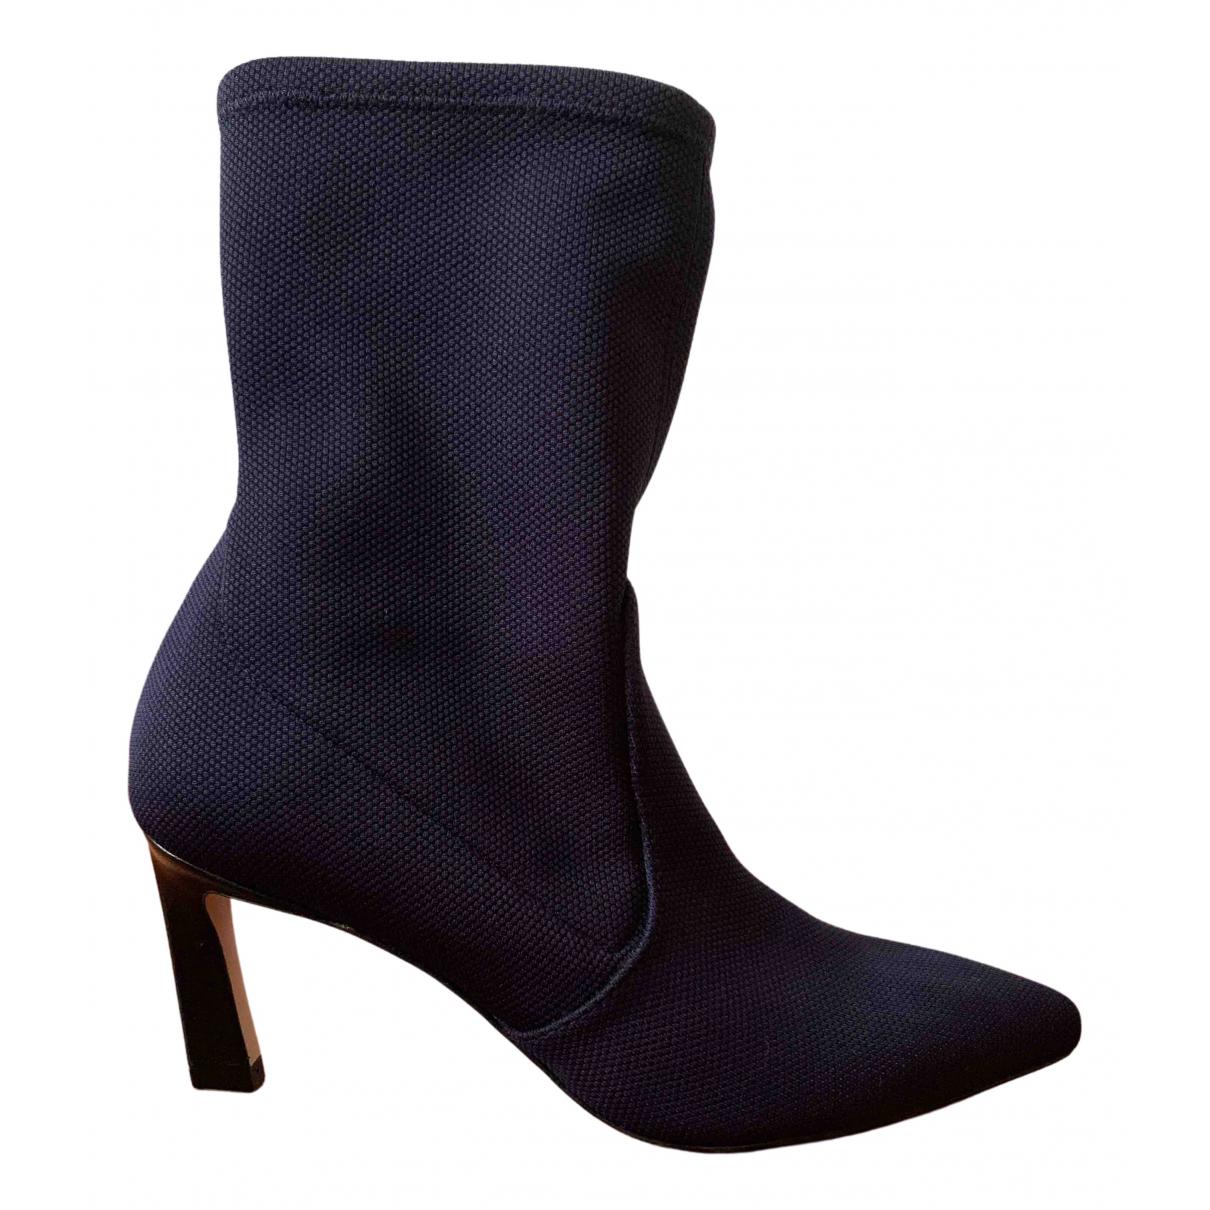 Stuart Weitzman N Navy Cloth Boots for Women 34.5 EU